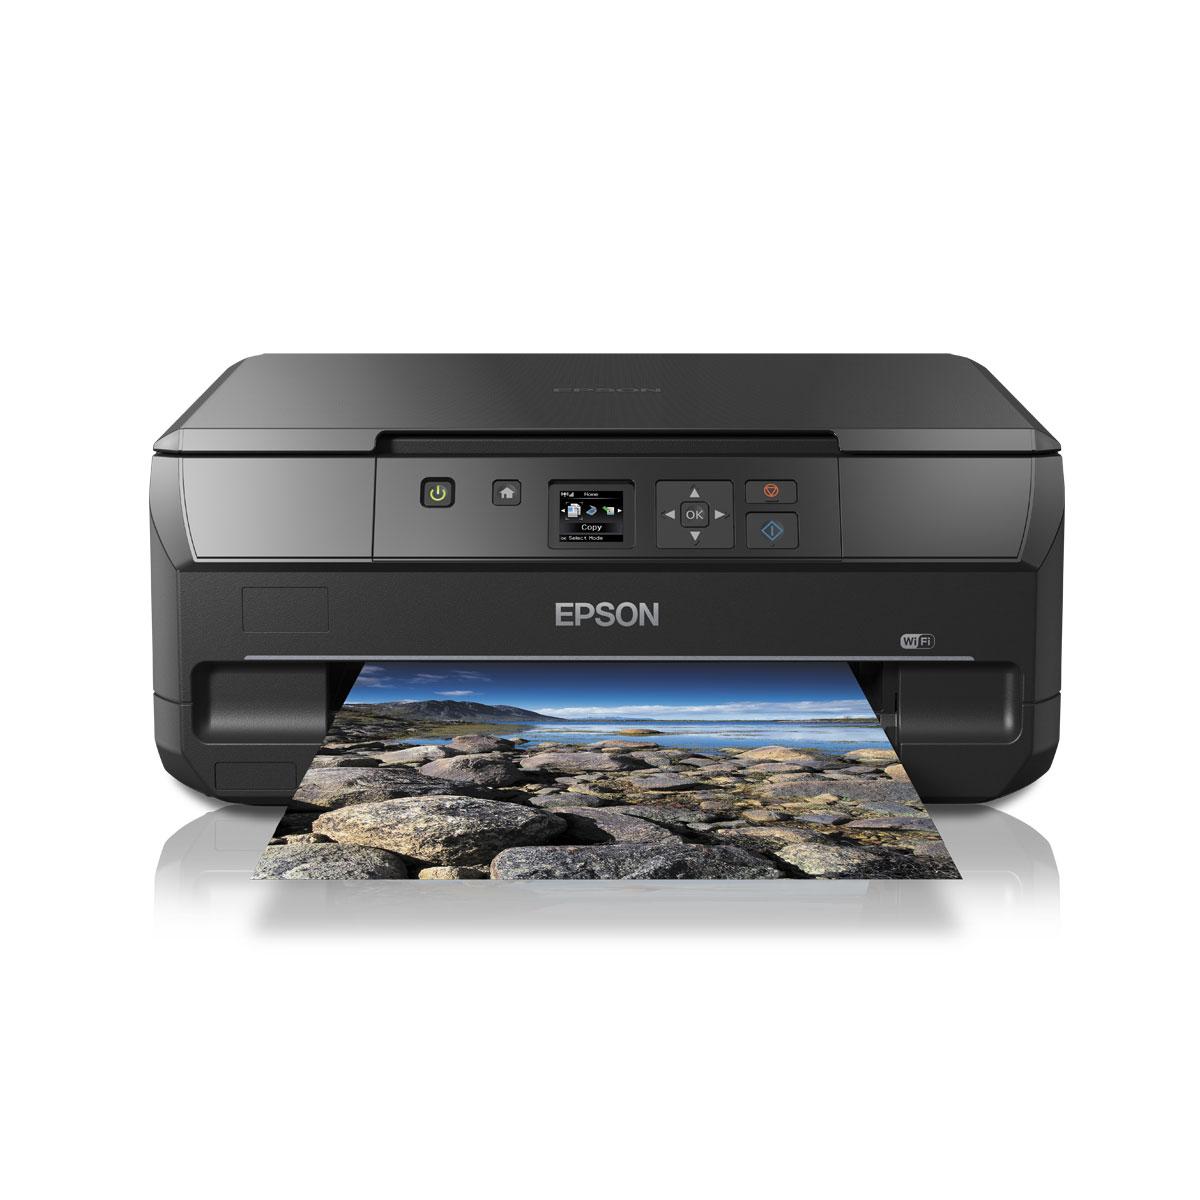 epson expression premium xp 510 imprimante multifonction. Black Bedroom Furniture Sets. Home Design Ideas